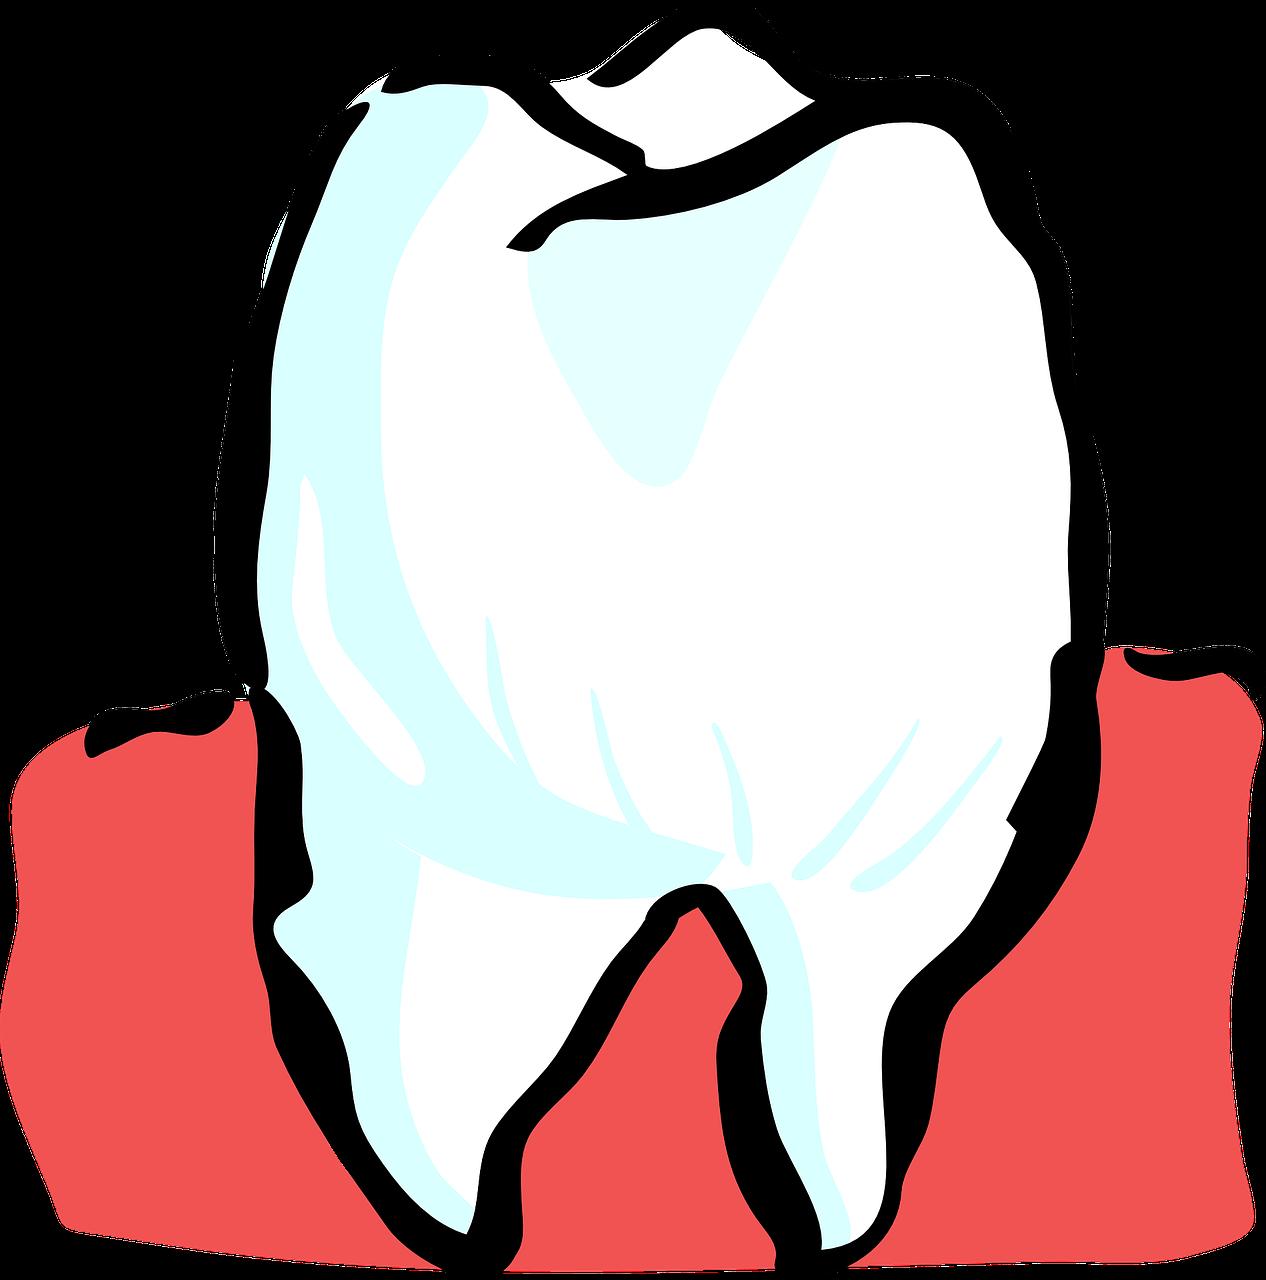 Tandartspraktijk Drs. T.S. Fennema BV wanneer spoed tandarts